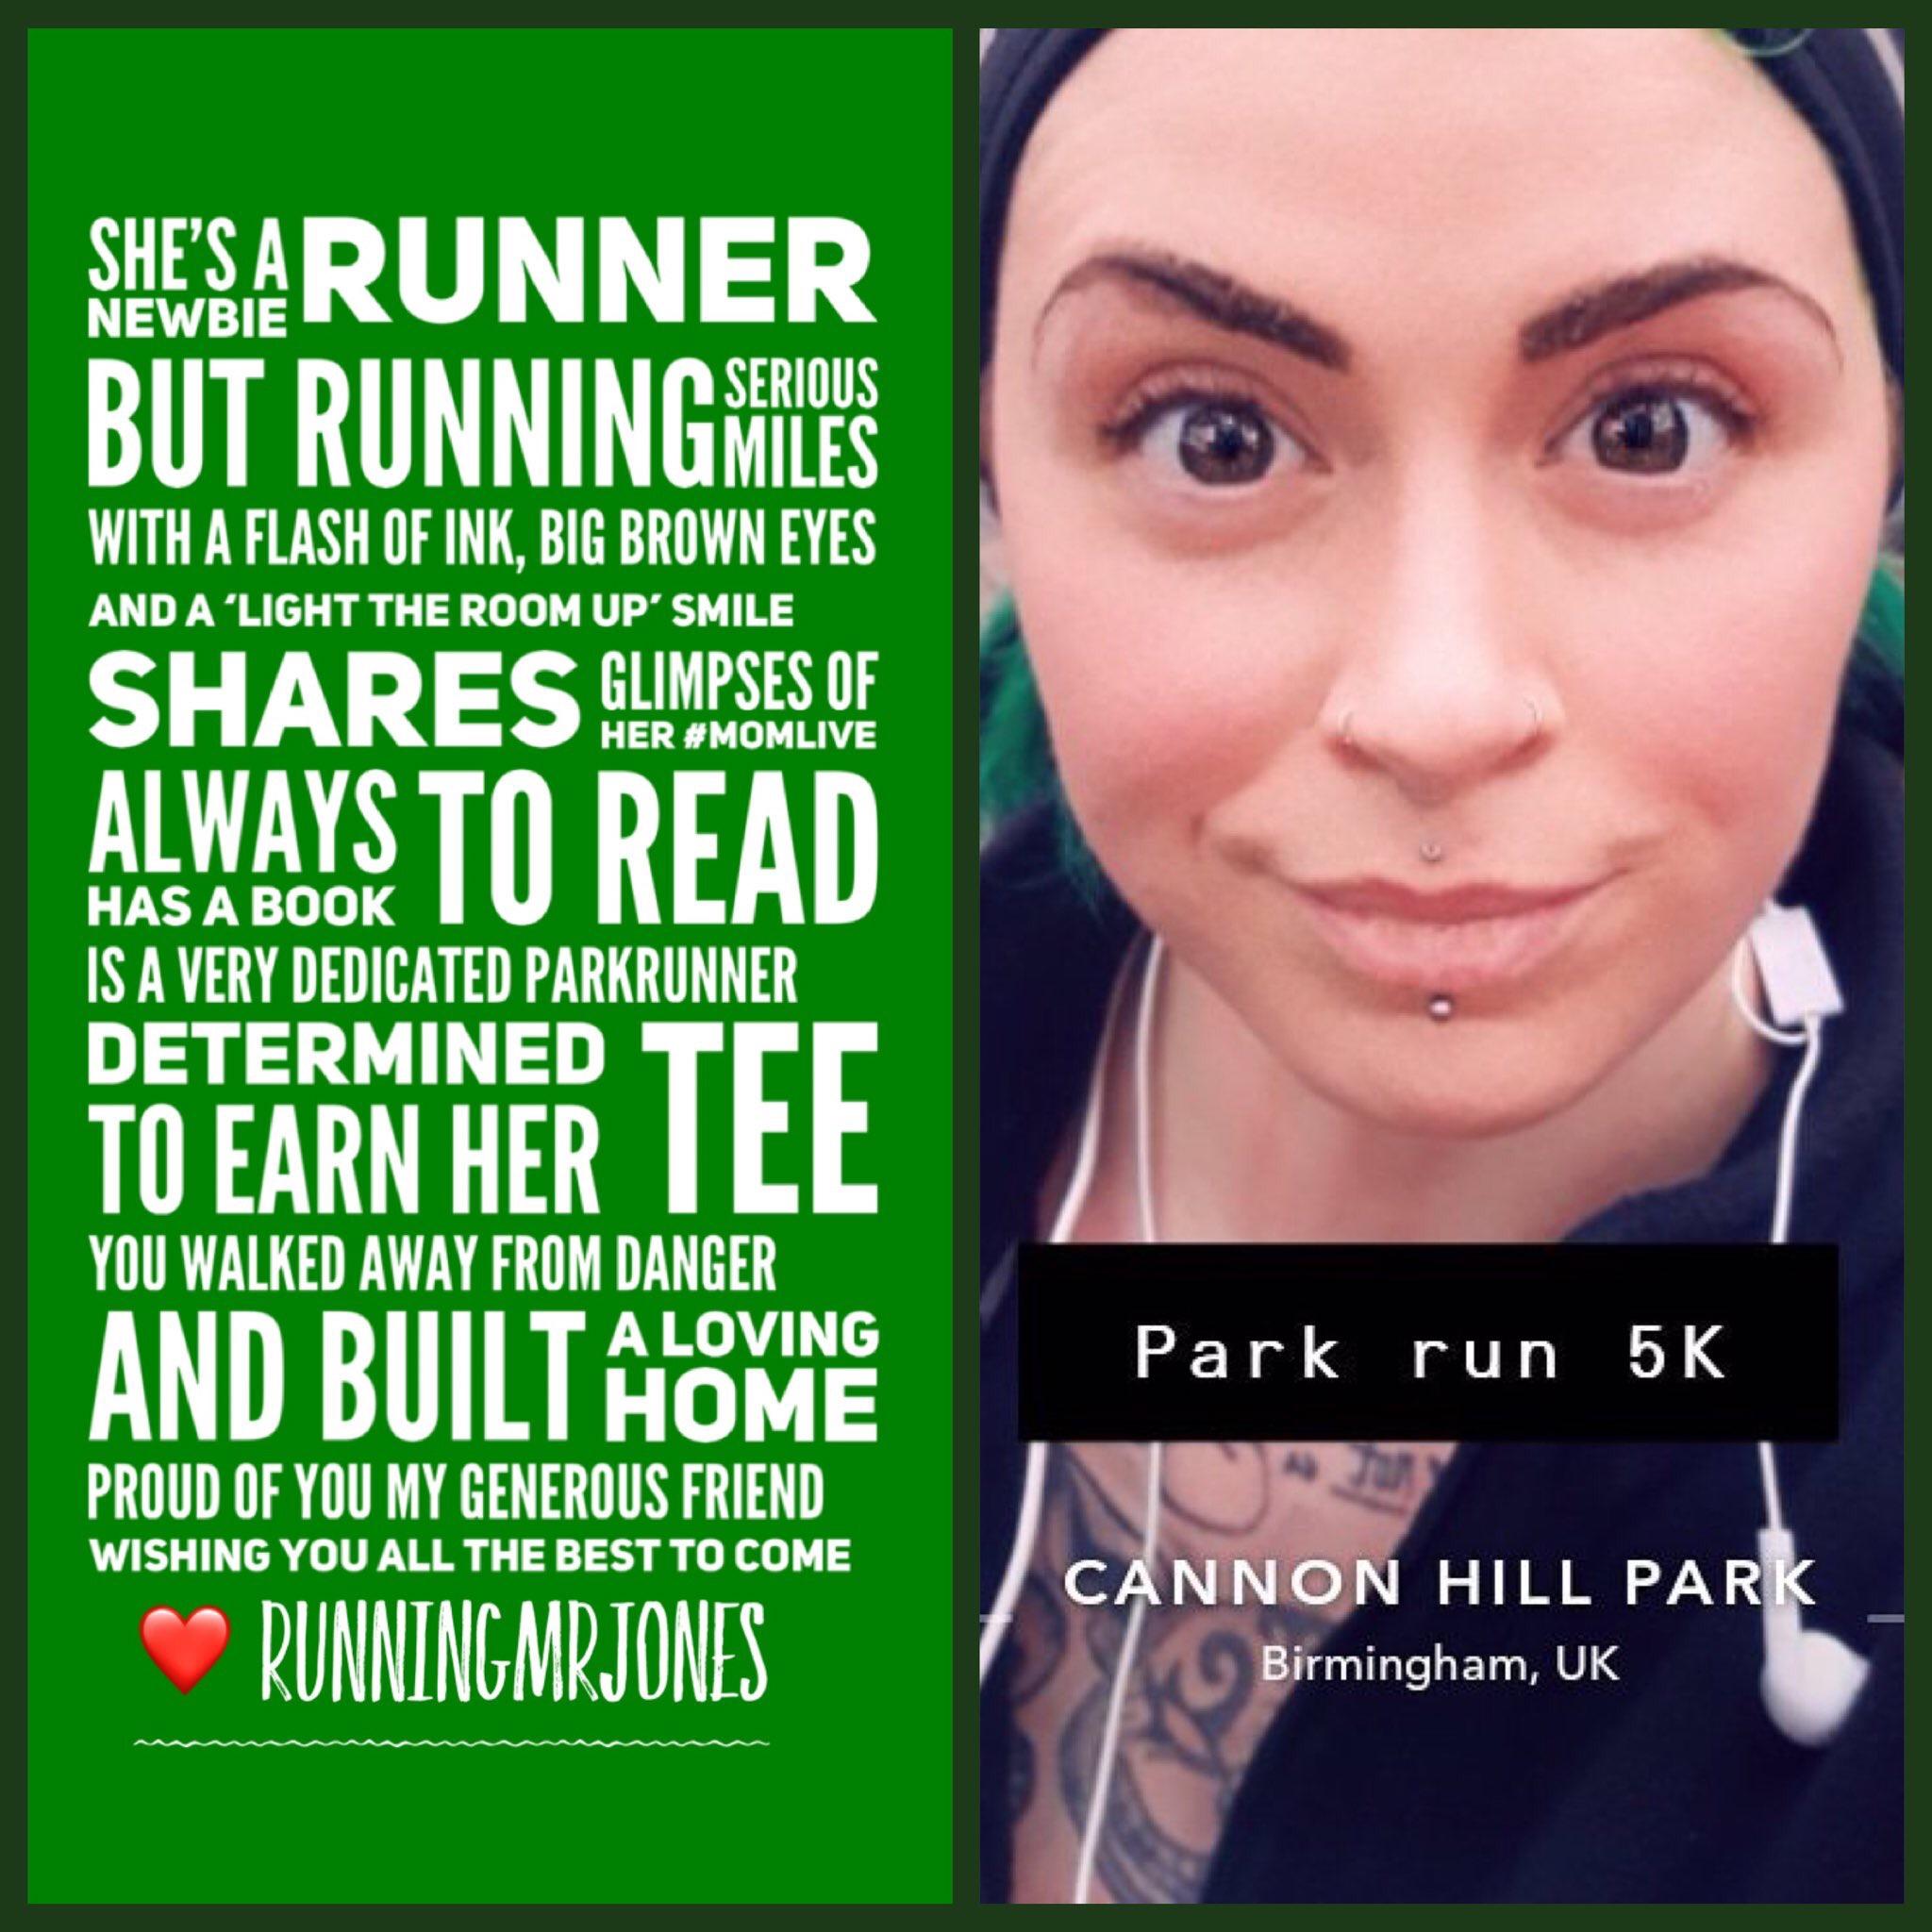 She's a newbie runner